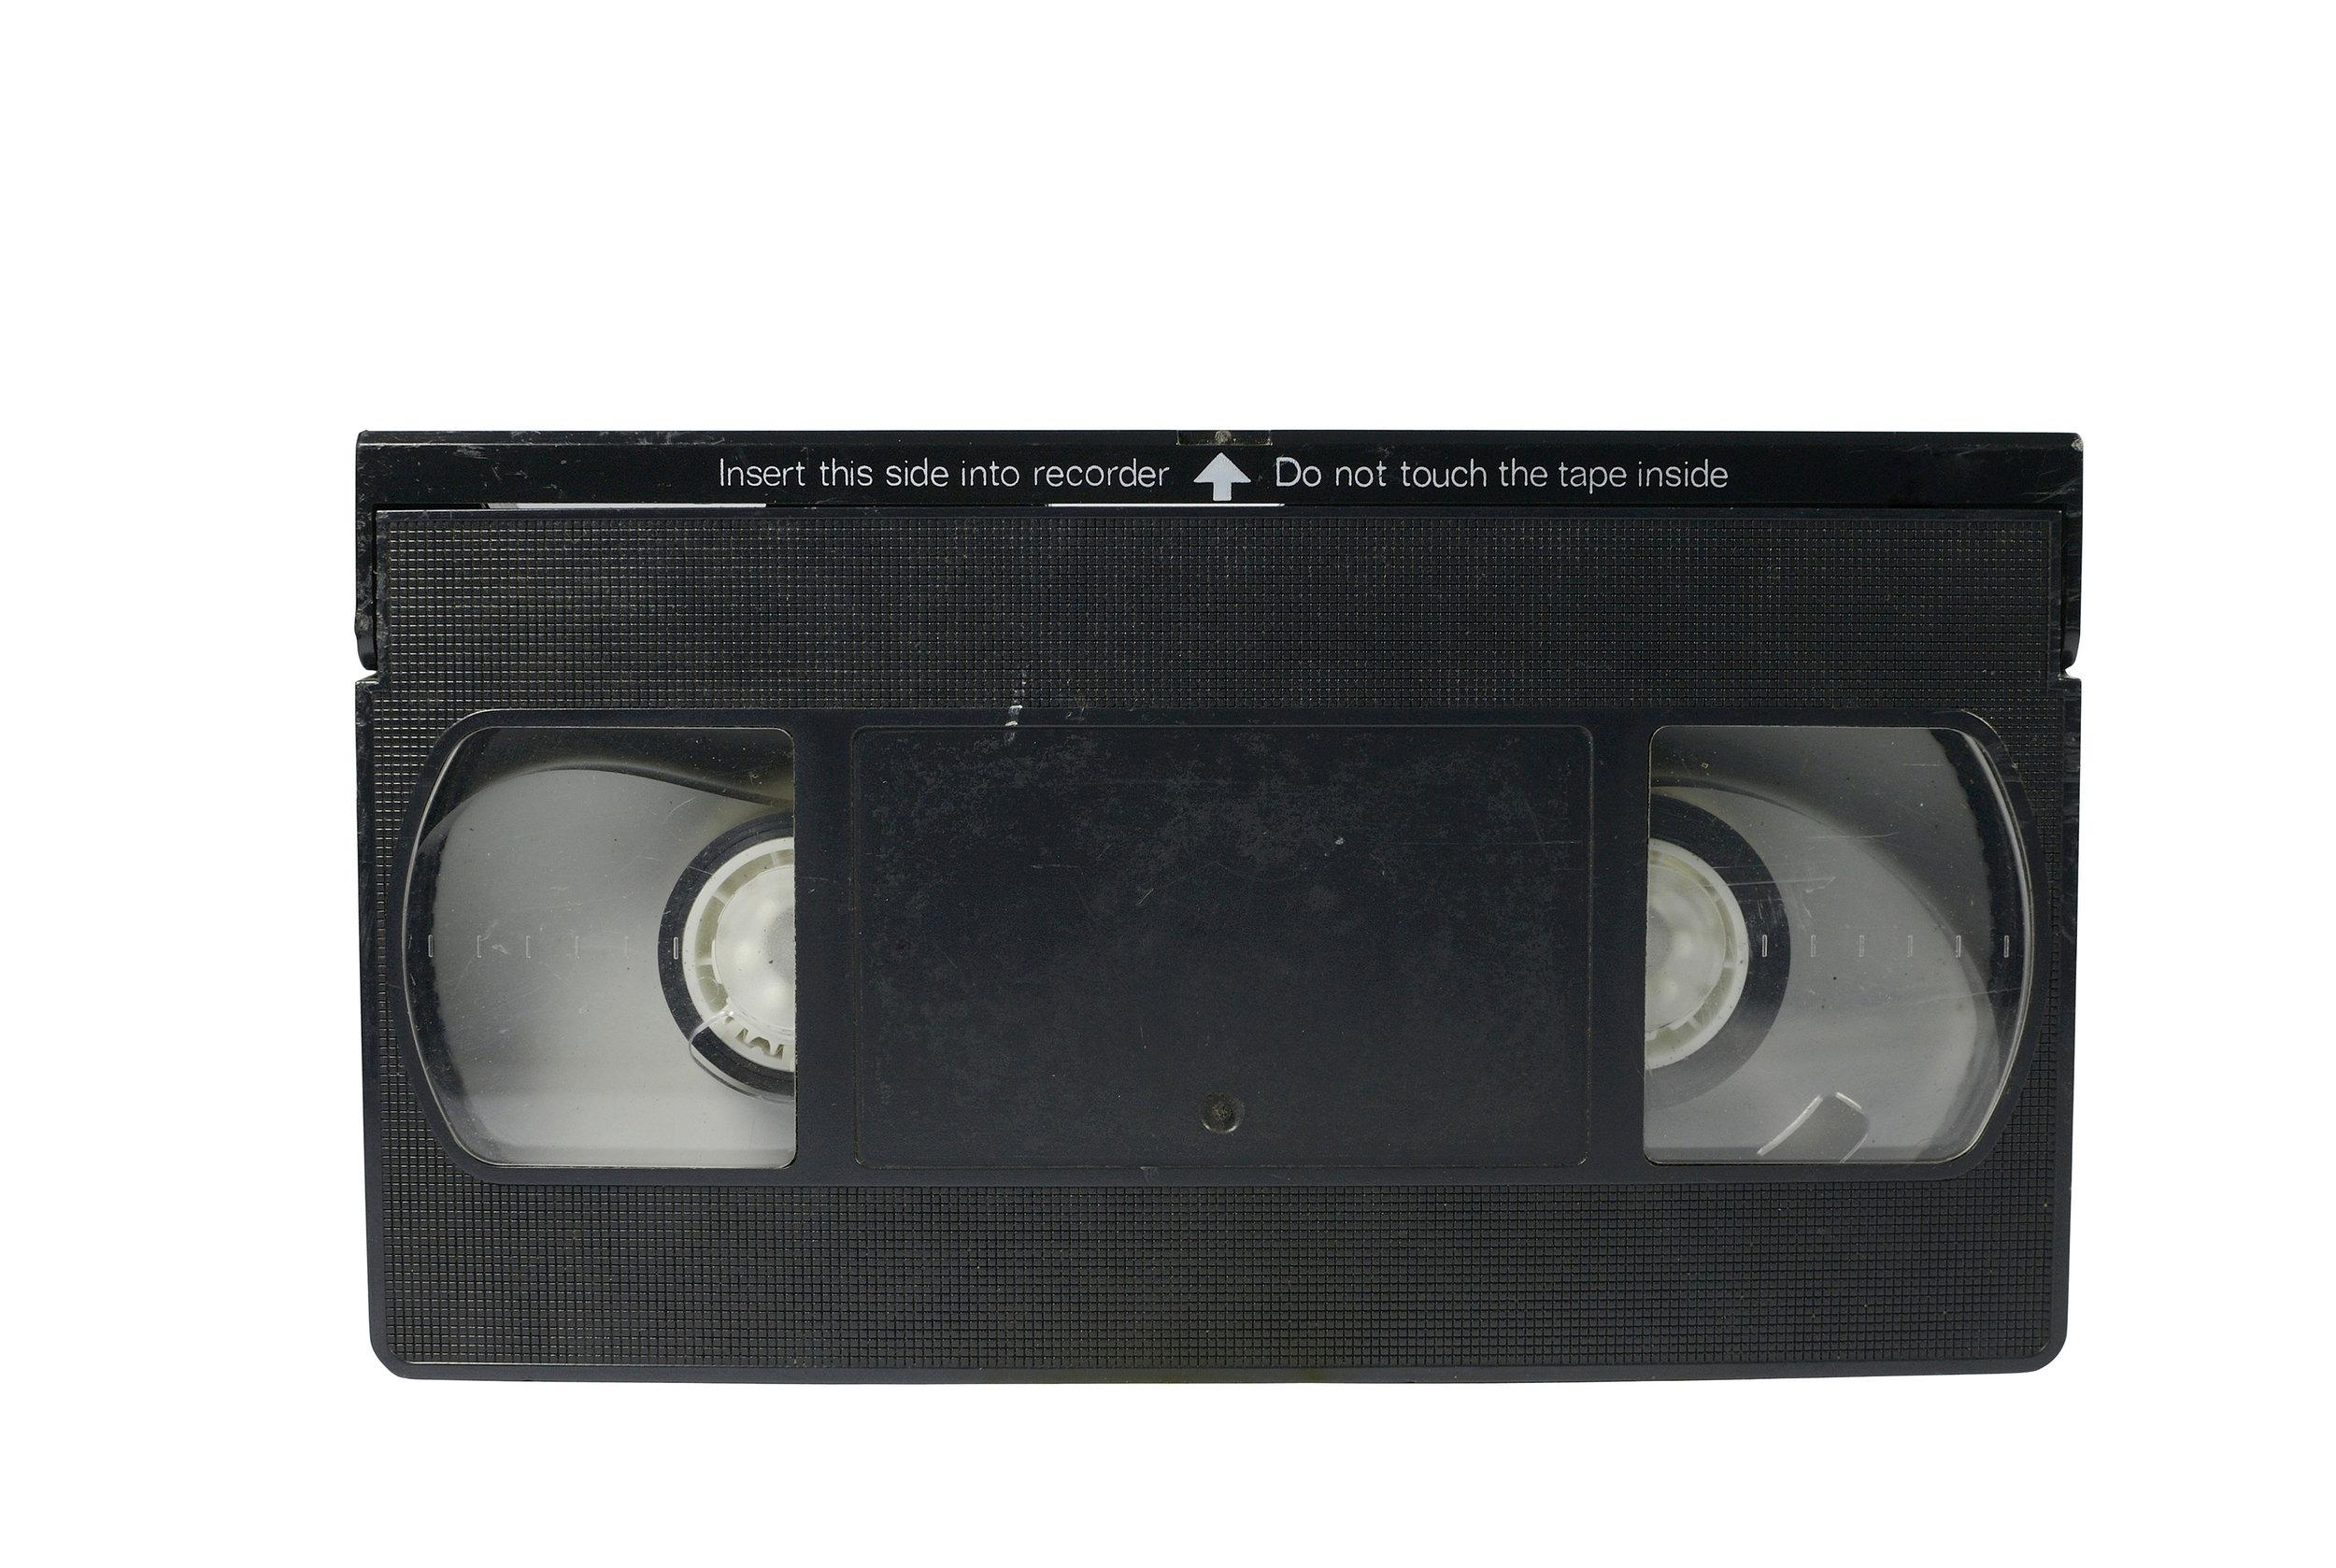 VHS Tape: Be Kind! Rewind!